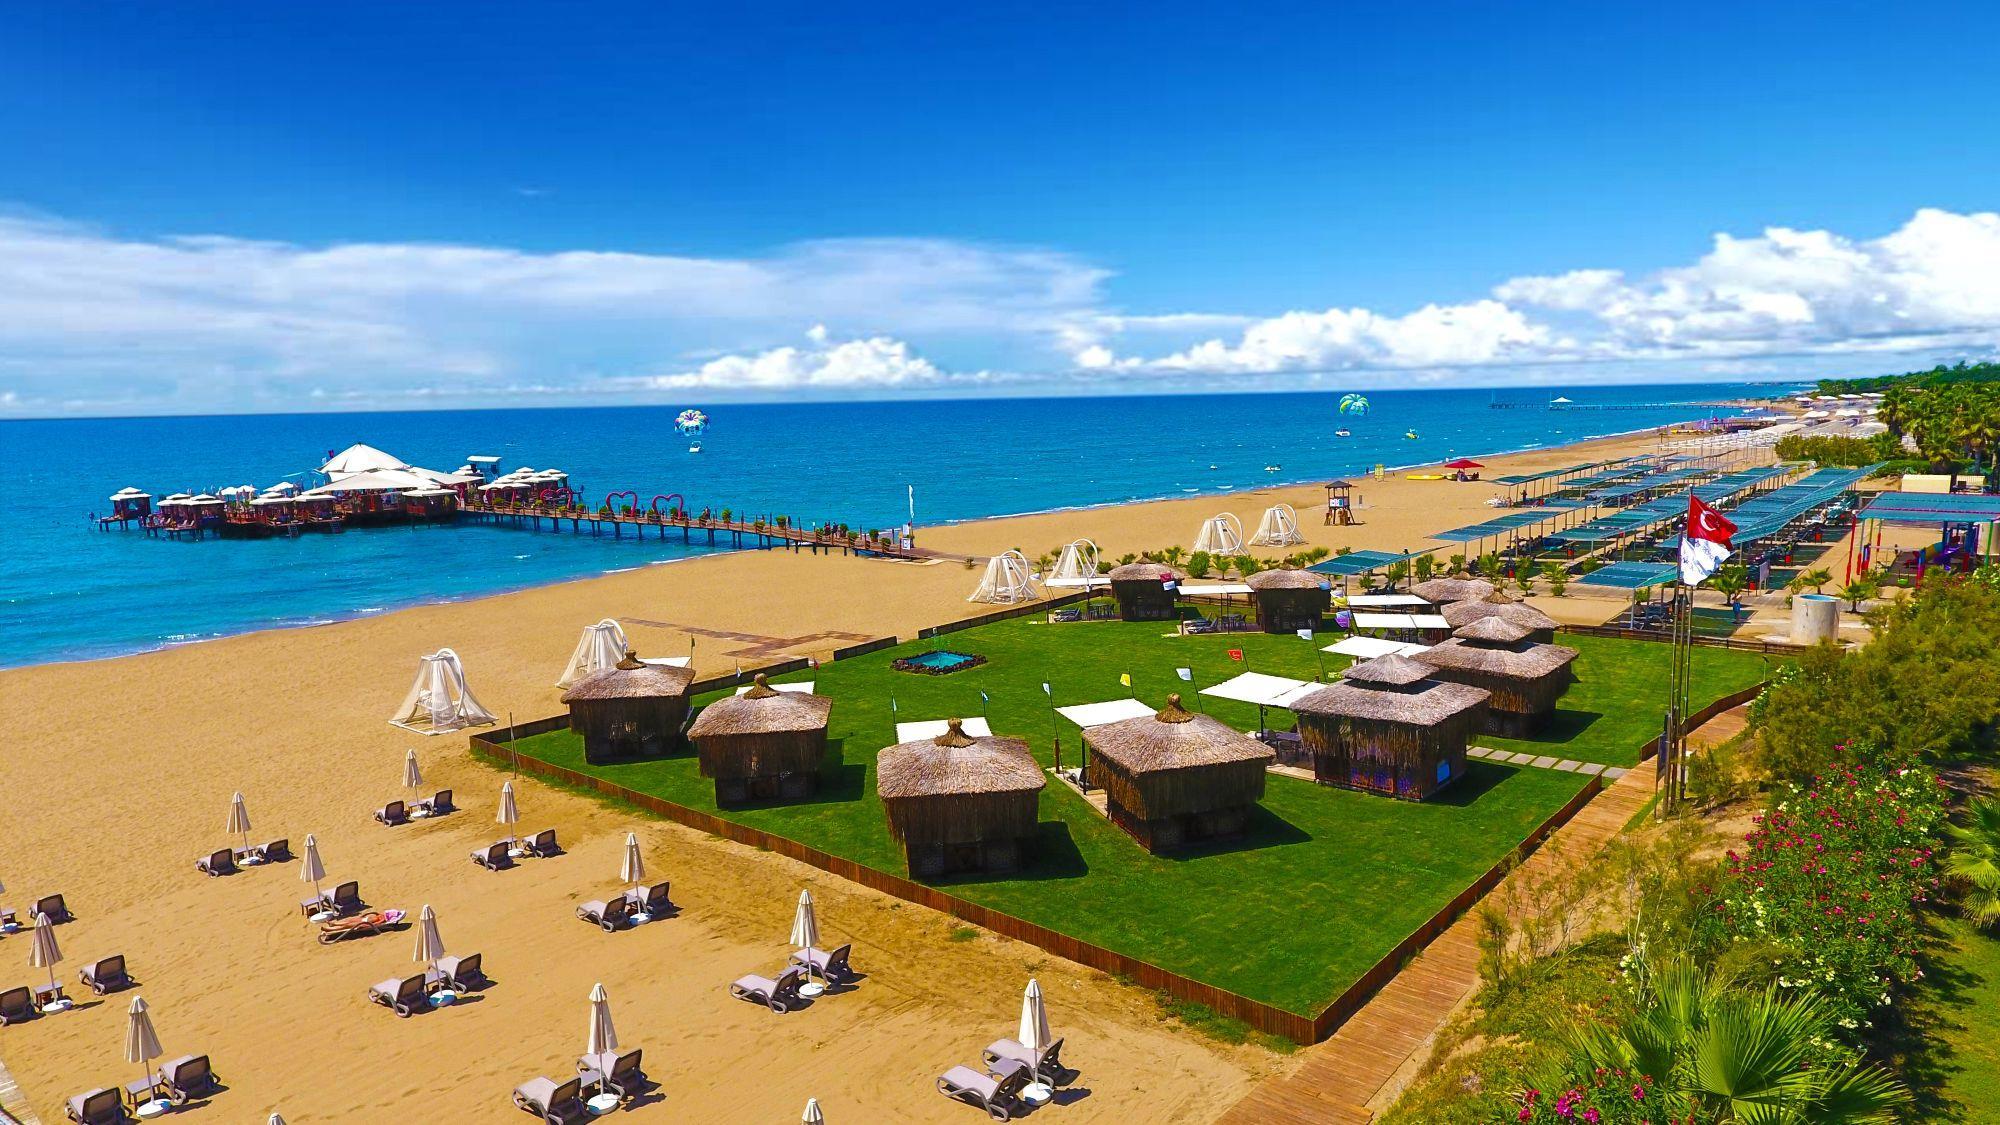 http://www.orextravel.sk/OREX/hotelphotos/vonresort-golden-coast-general-0047.jpg